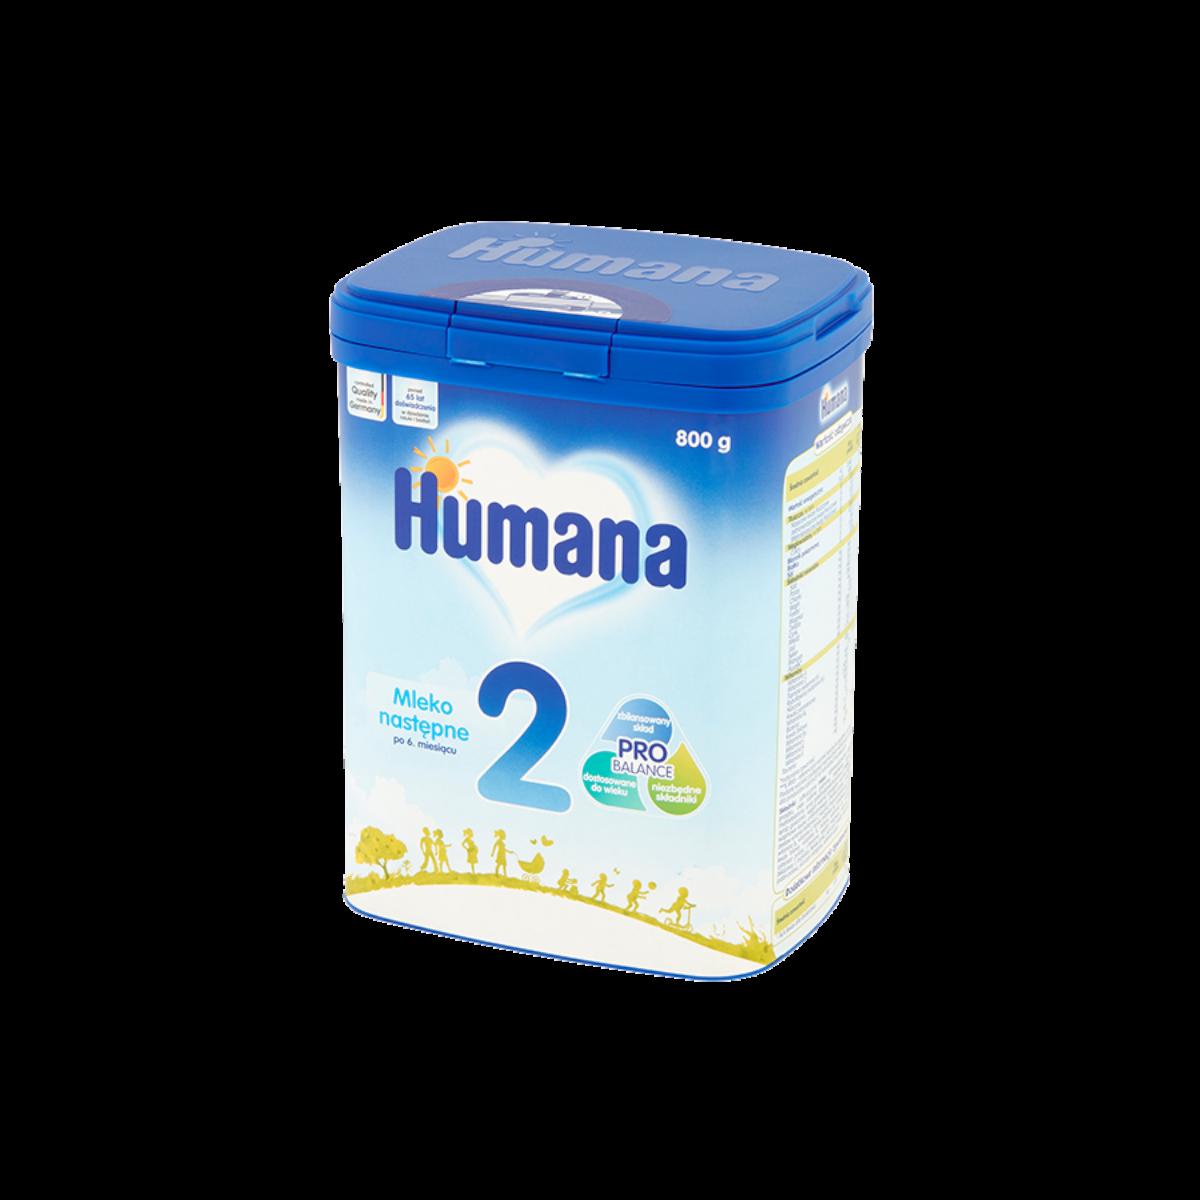 humana_2_800g